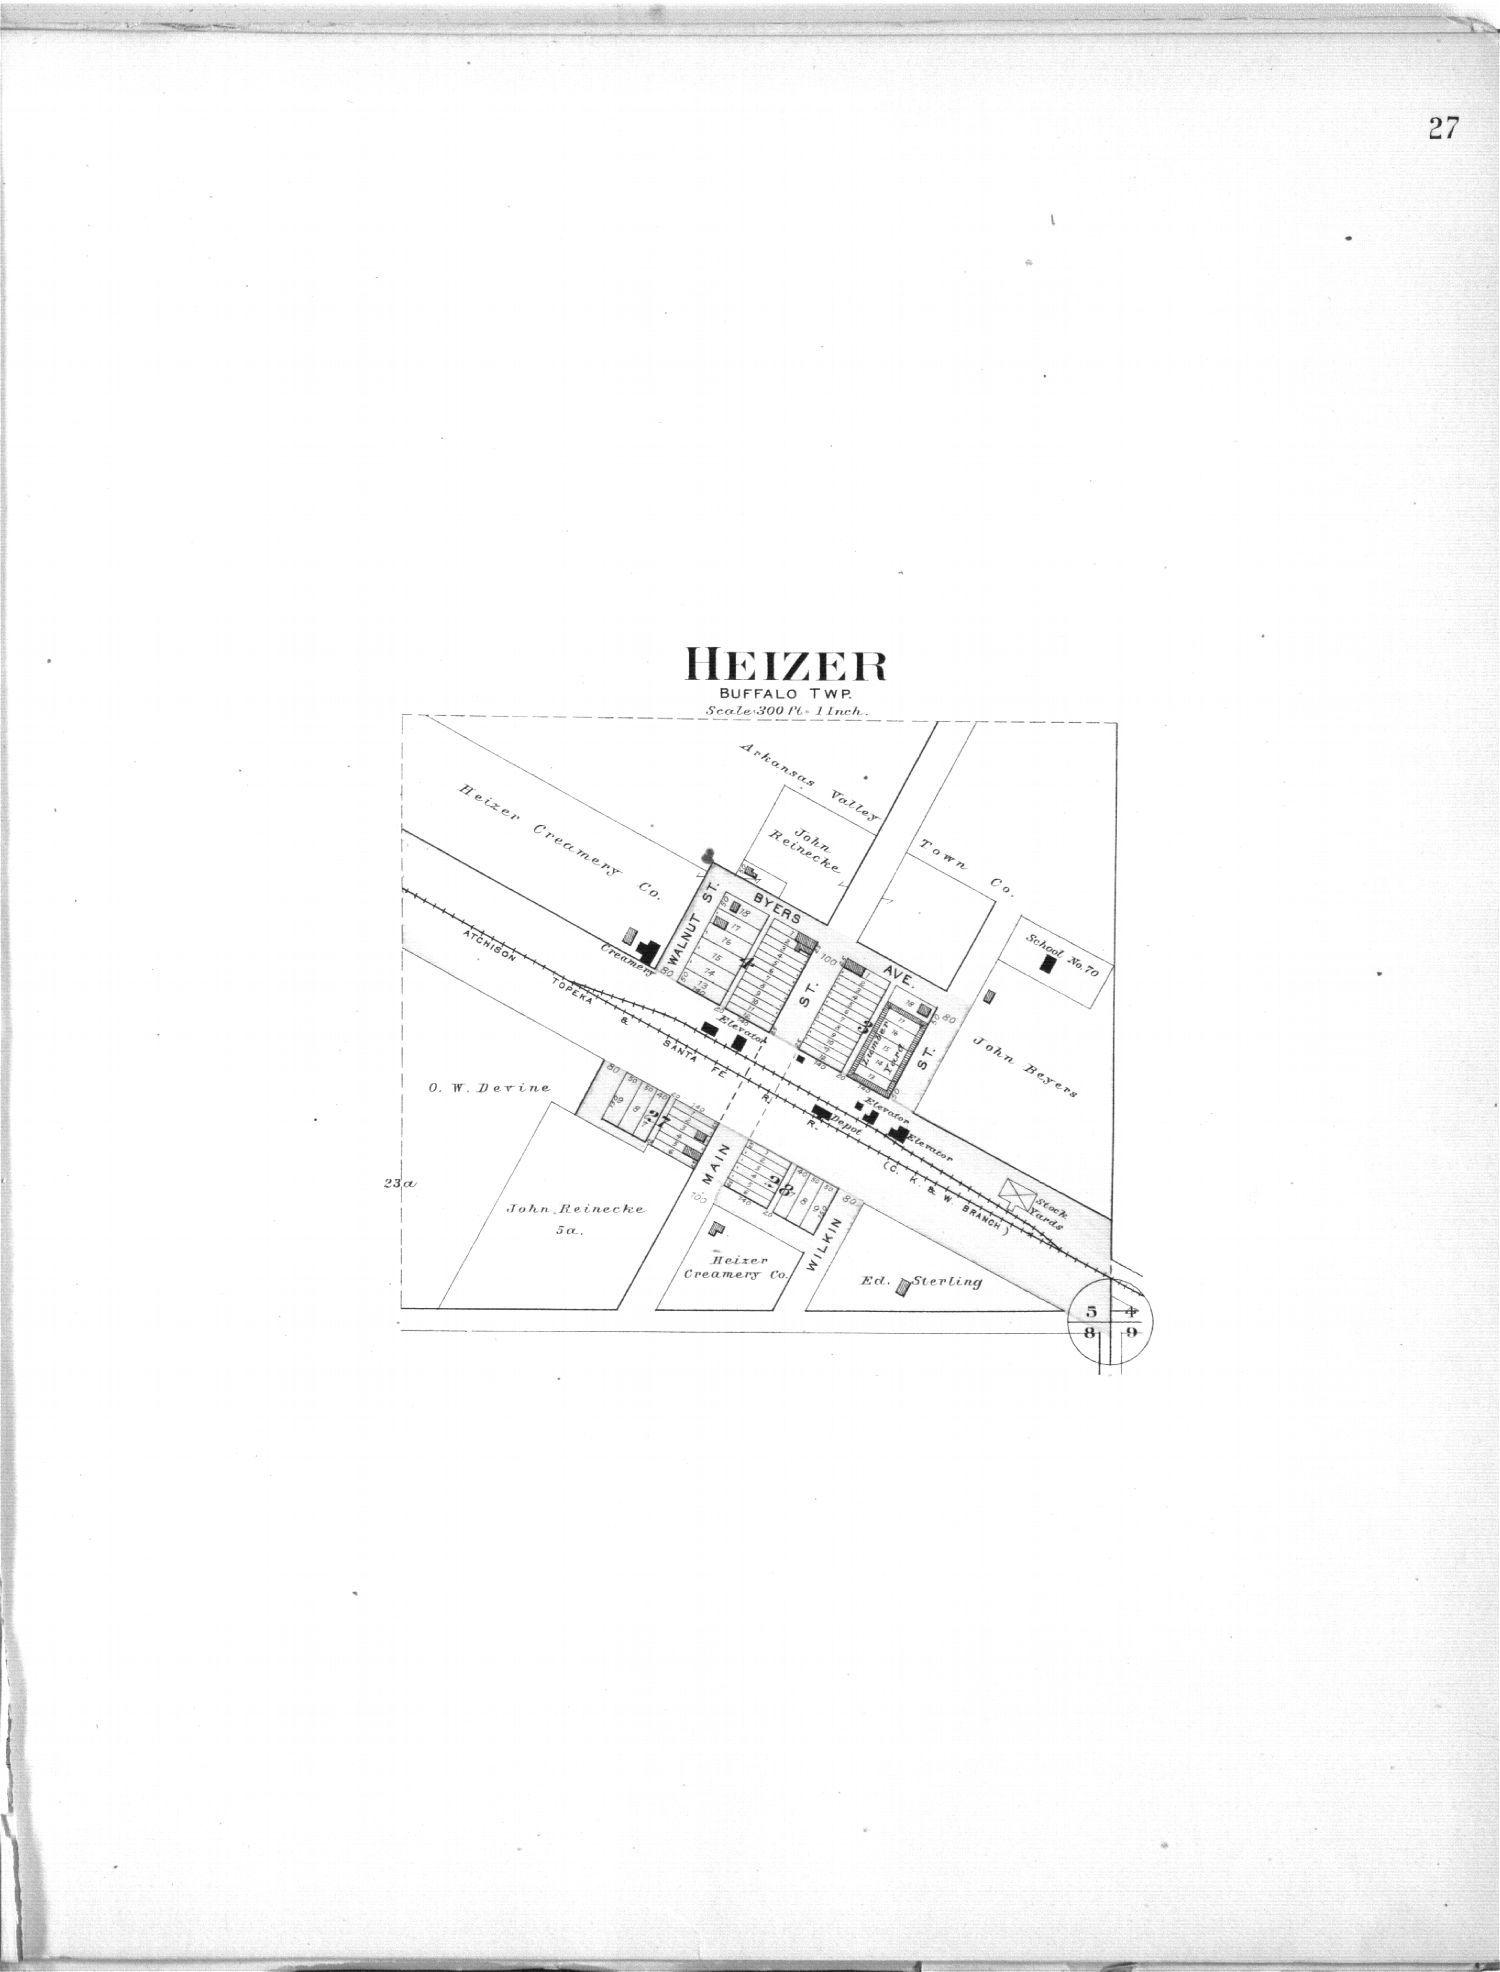 Plat book, Barton County, Kansas - 27